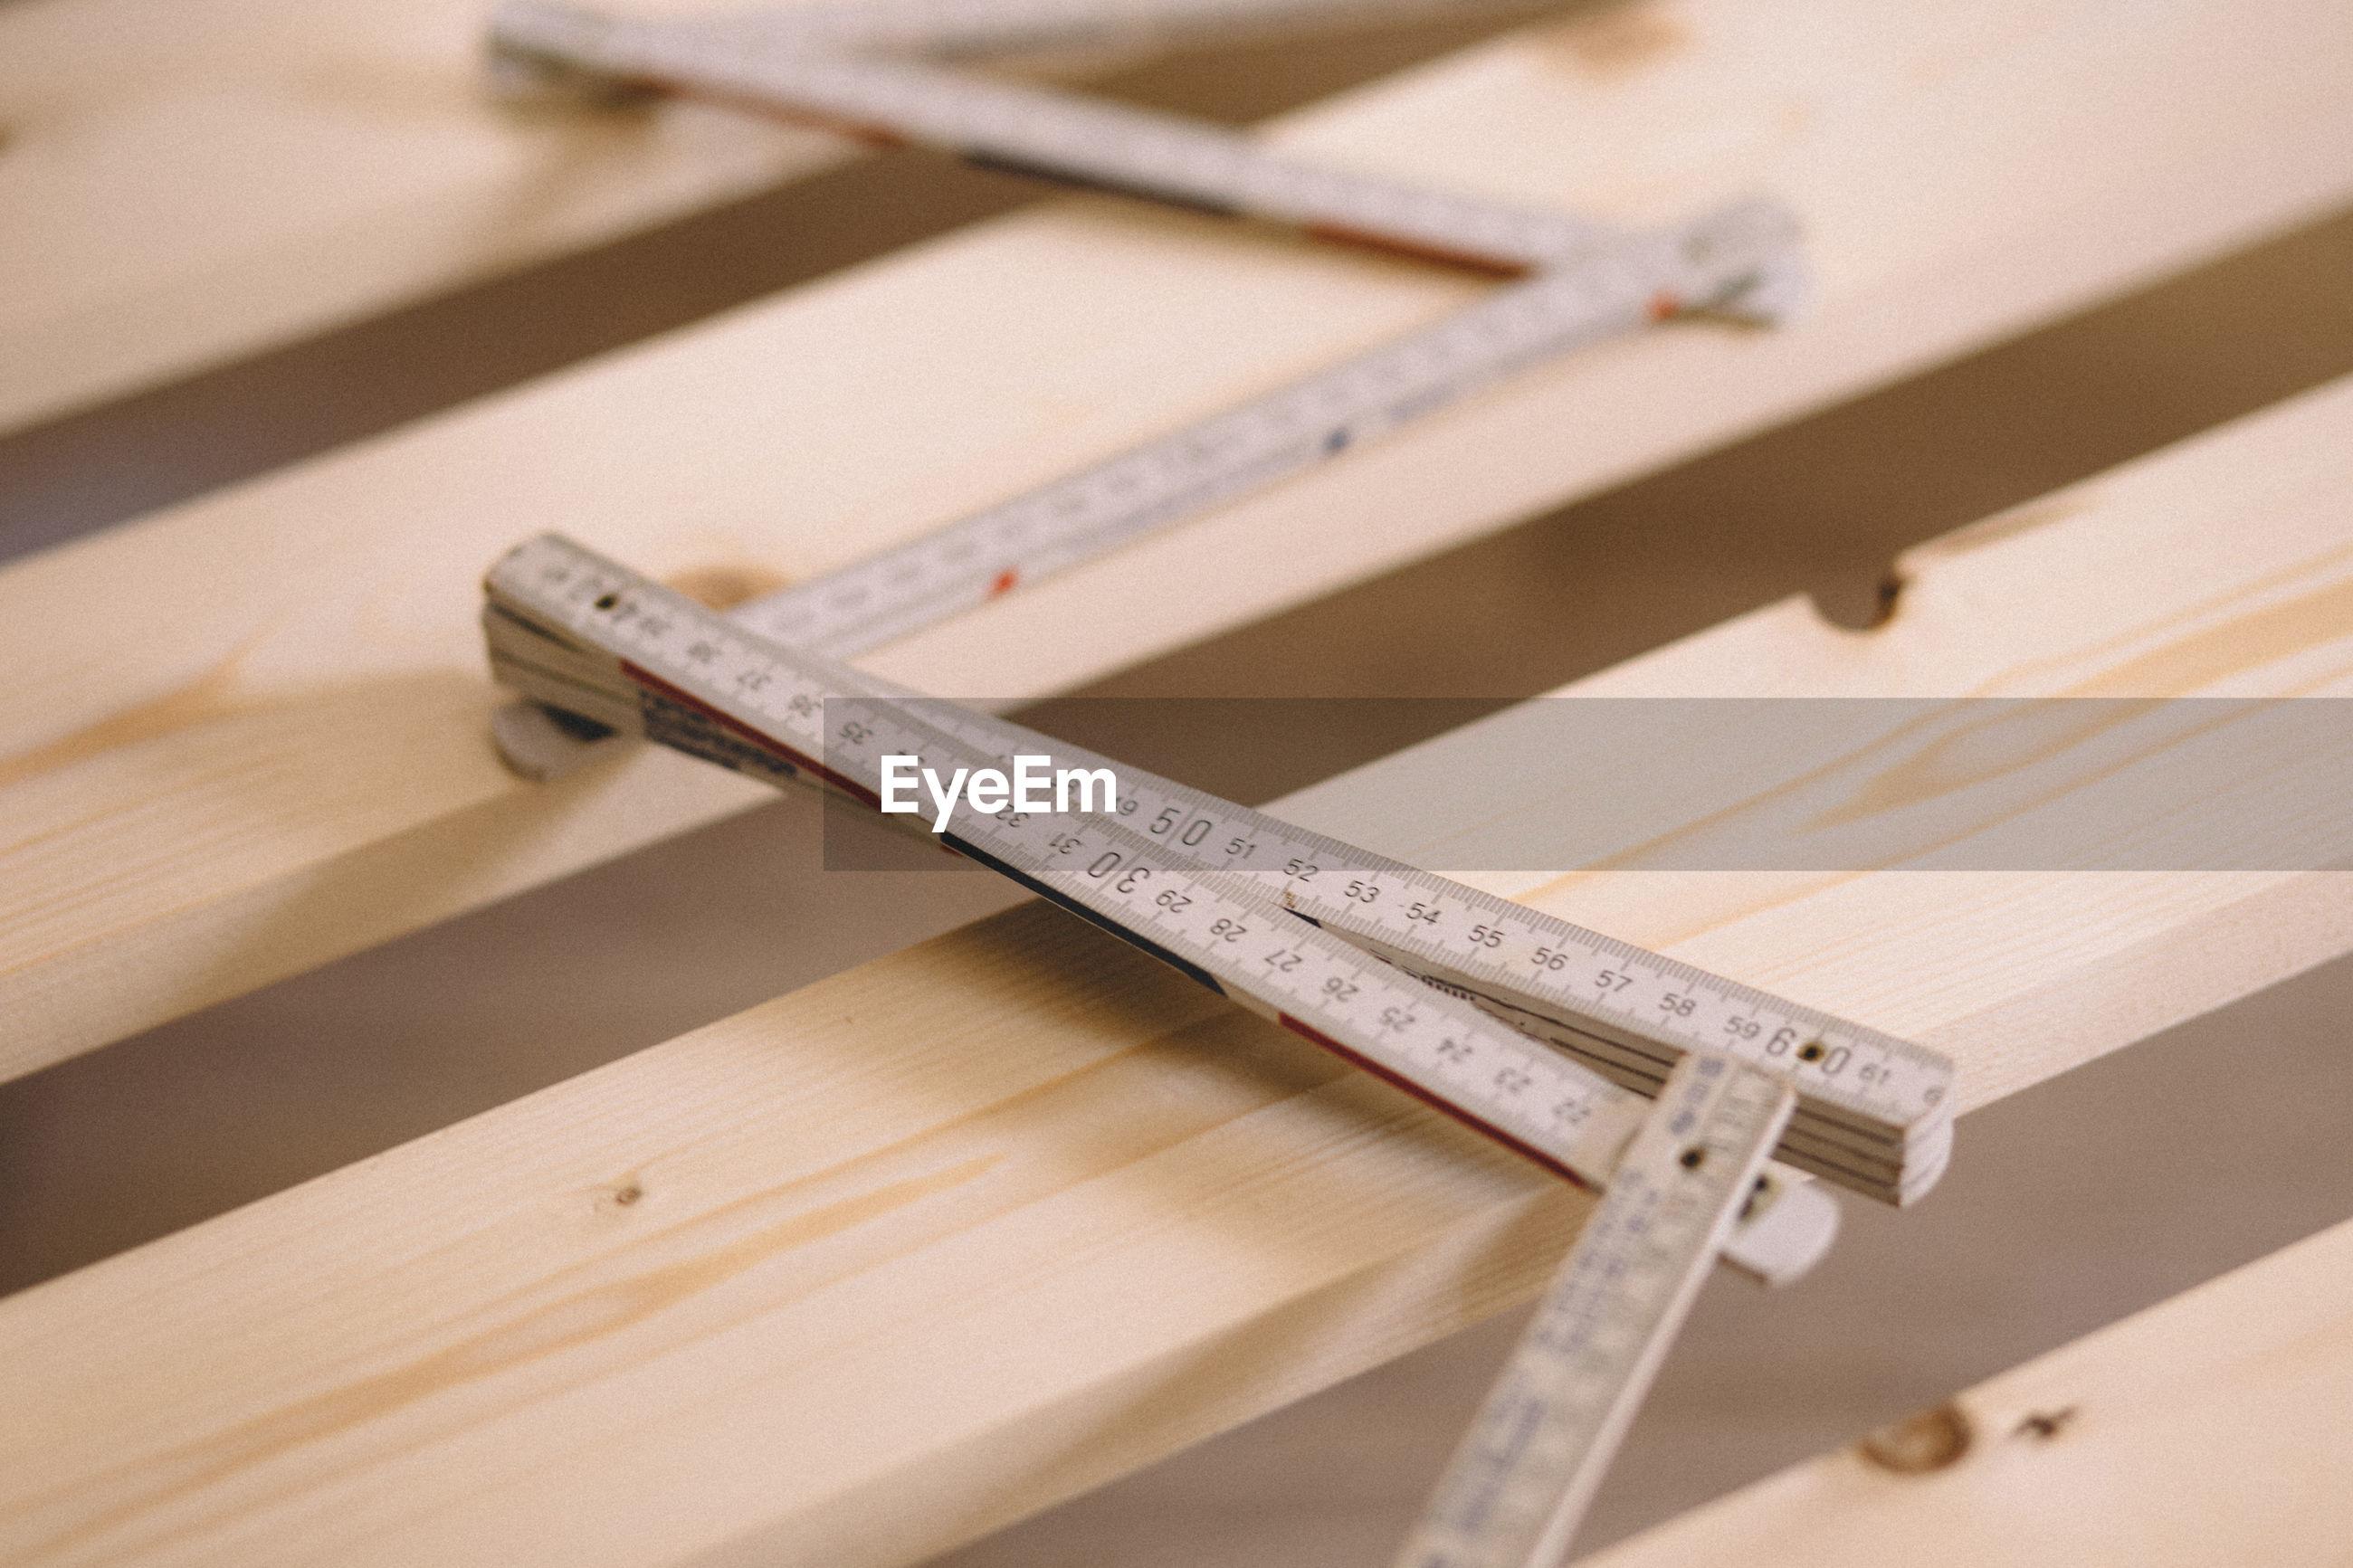 Instrument of measurement on workbench in workshop